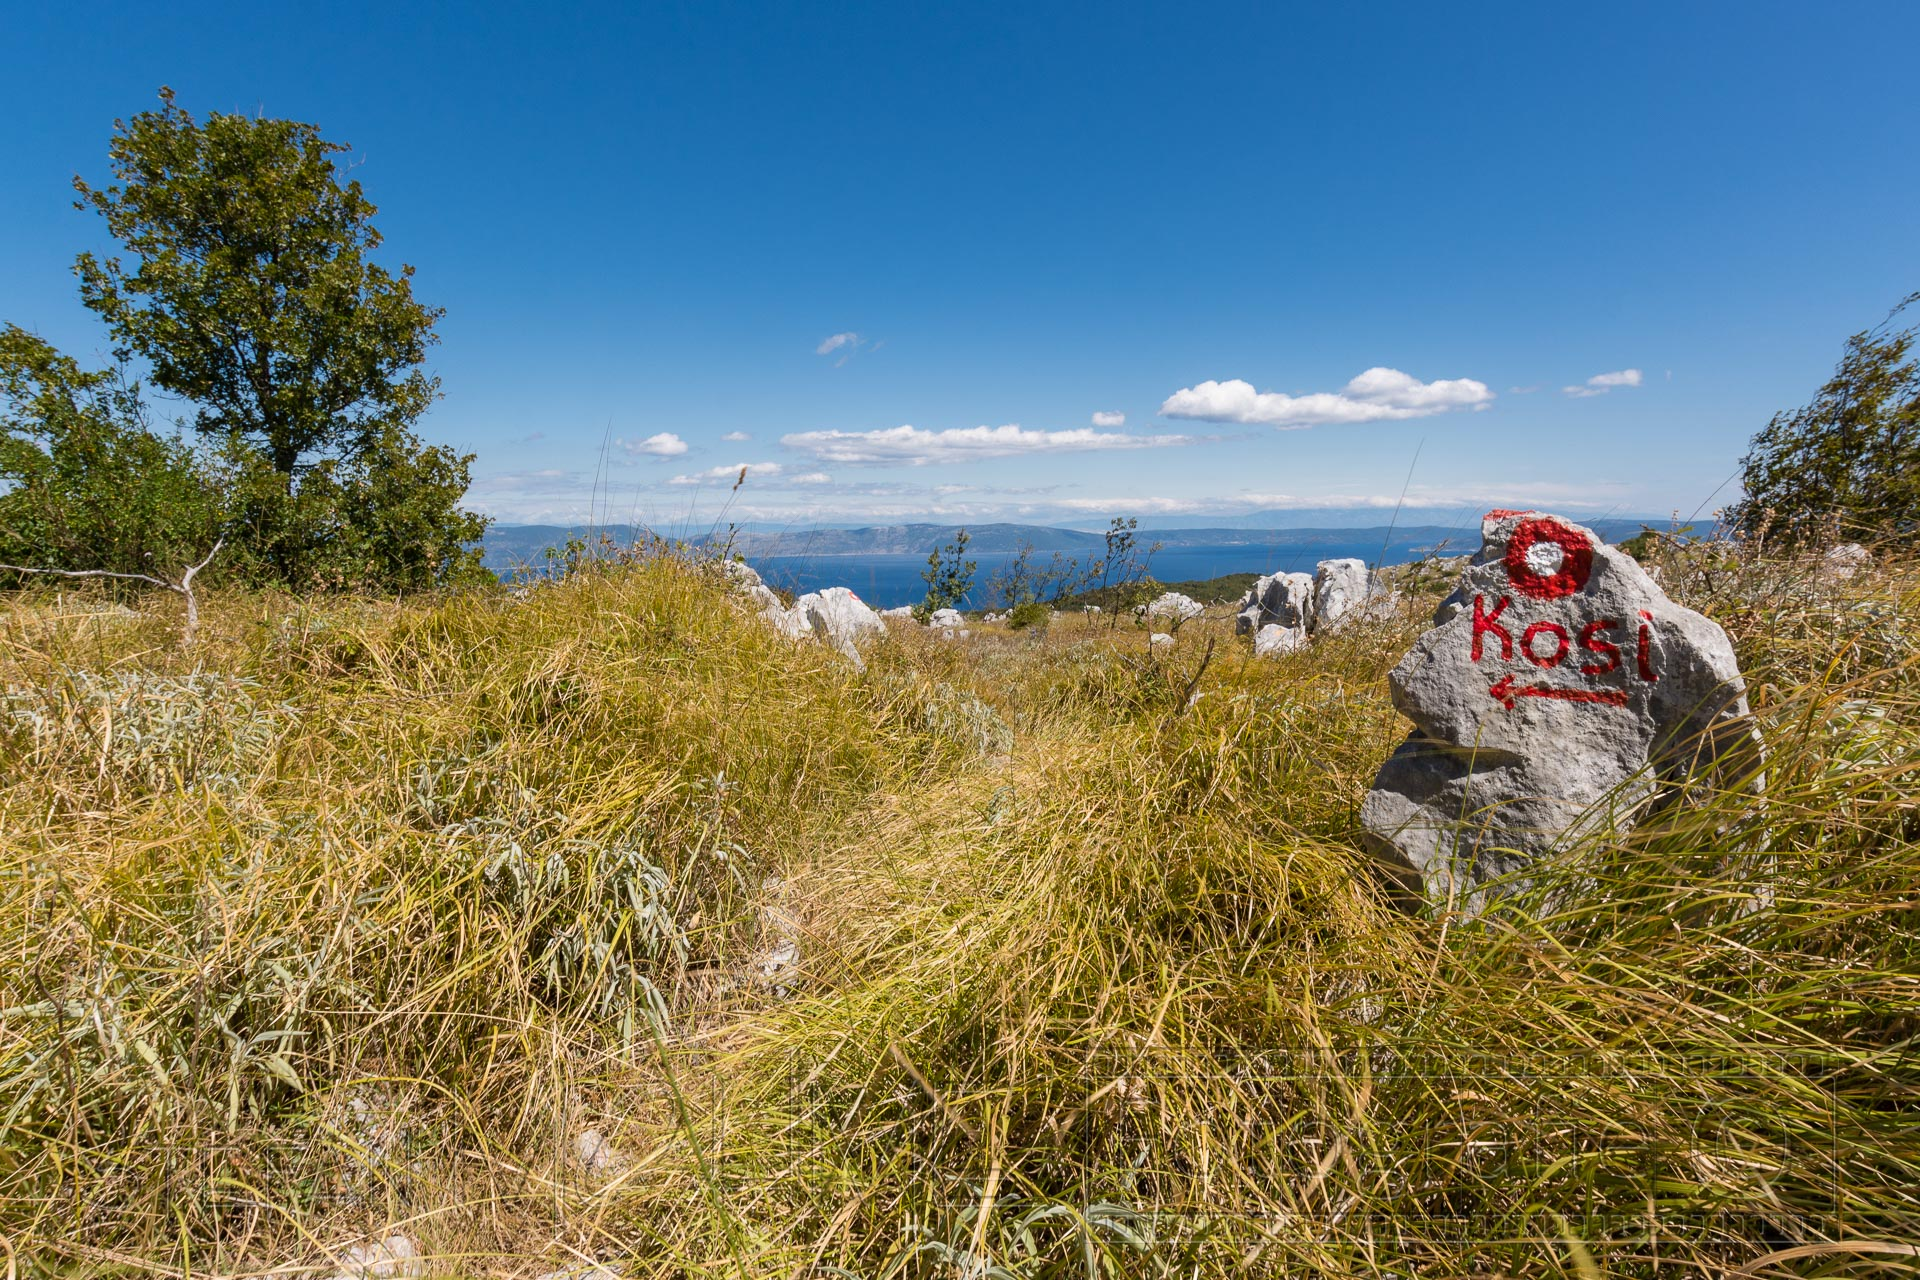 Wanderung auf Istrien, Kroatien, Halbinsel Koromacno.